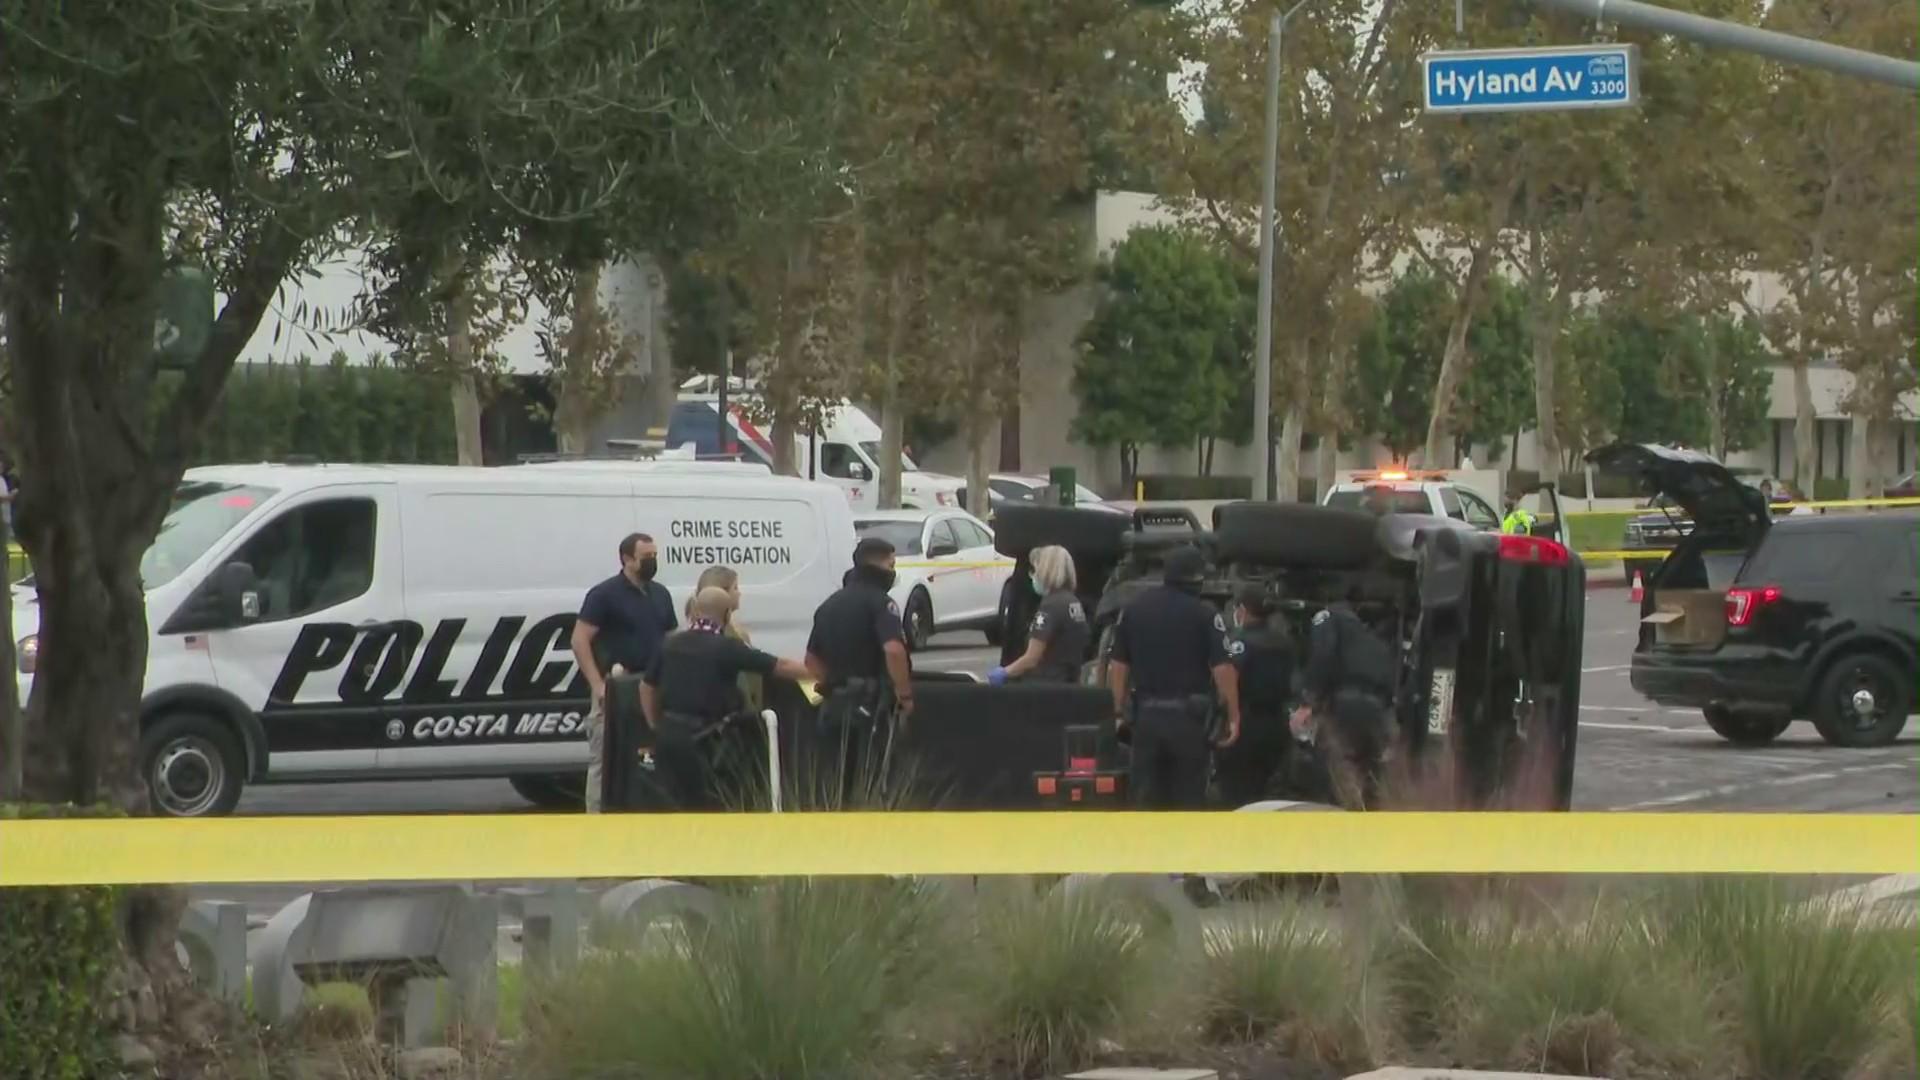 An investigation is underway following a fatal crash in Costa Mesa on Oct. 22, 2020. (KTLA)